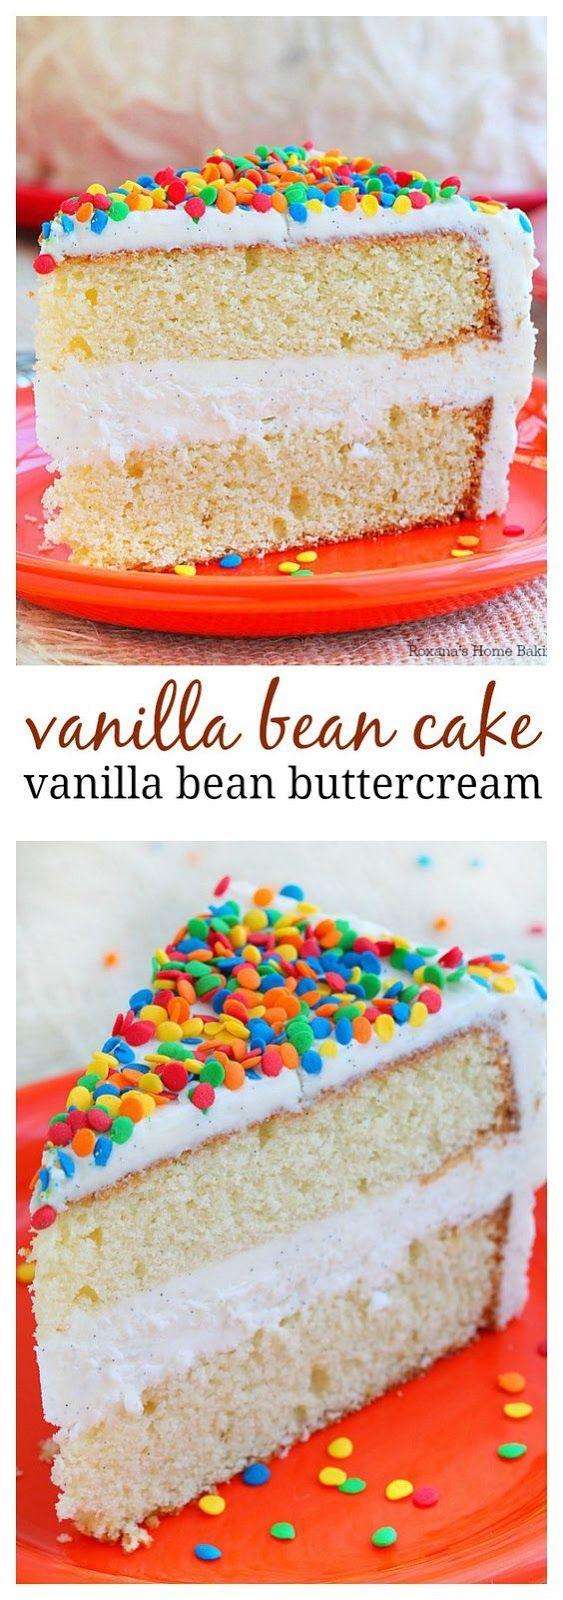 VANILLA BEAN CAKE WITH VANILLA BEAN BUTTERCREAM RECIPE   Food And Cake Recipes